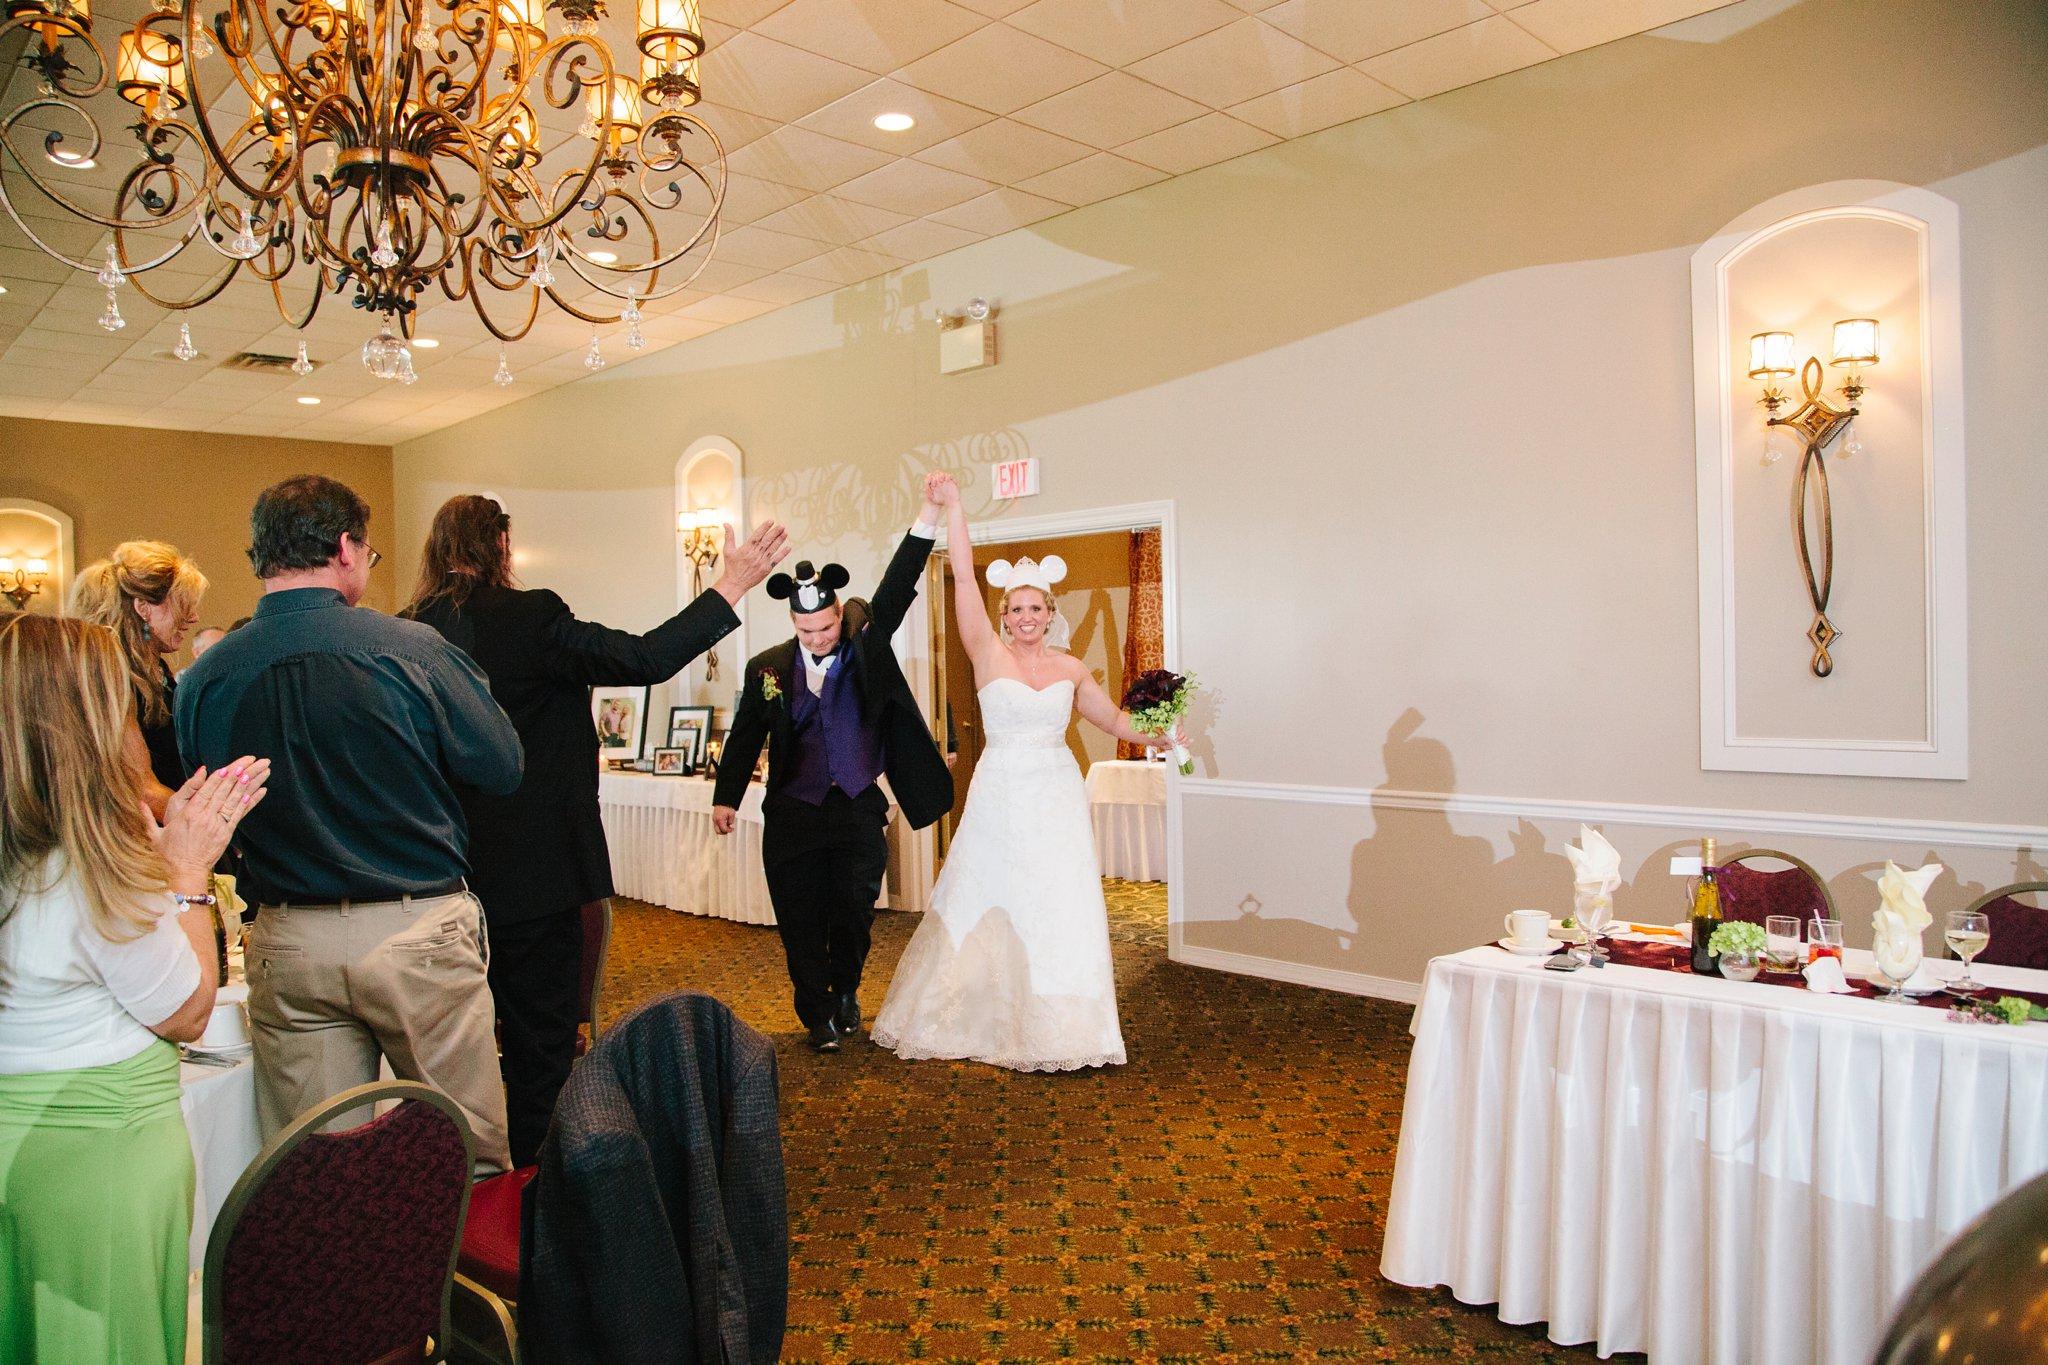 montdale_country_club_wedding_photos_photographer_scranton_pa7776.jpg